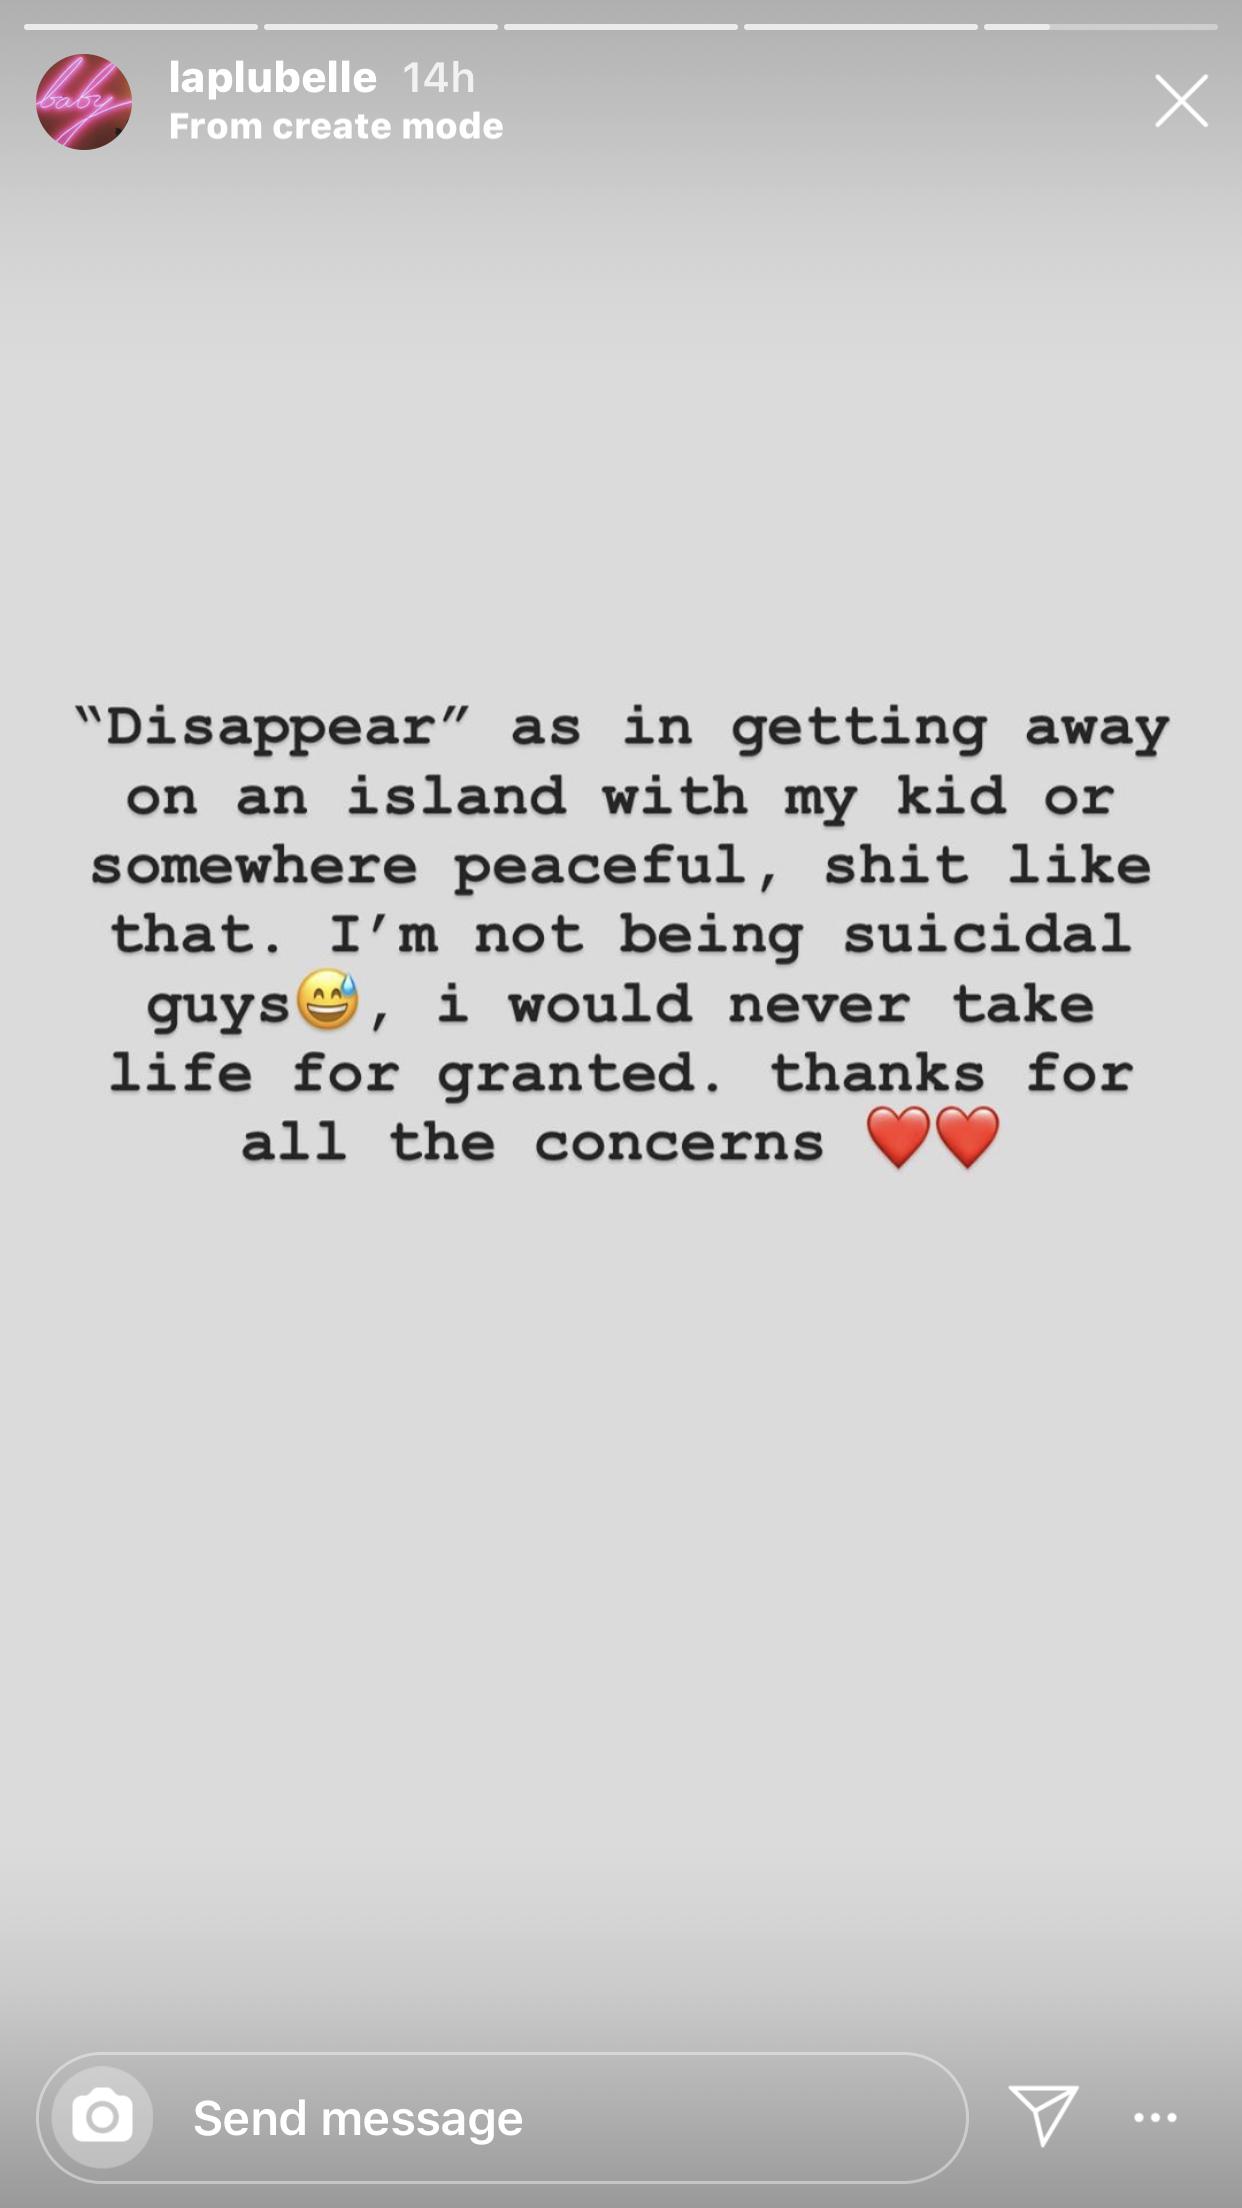 Amanda's post